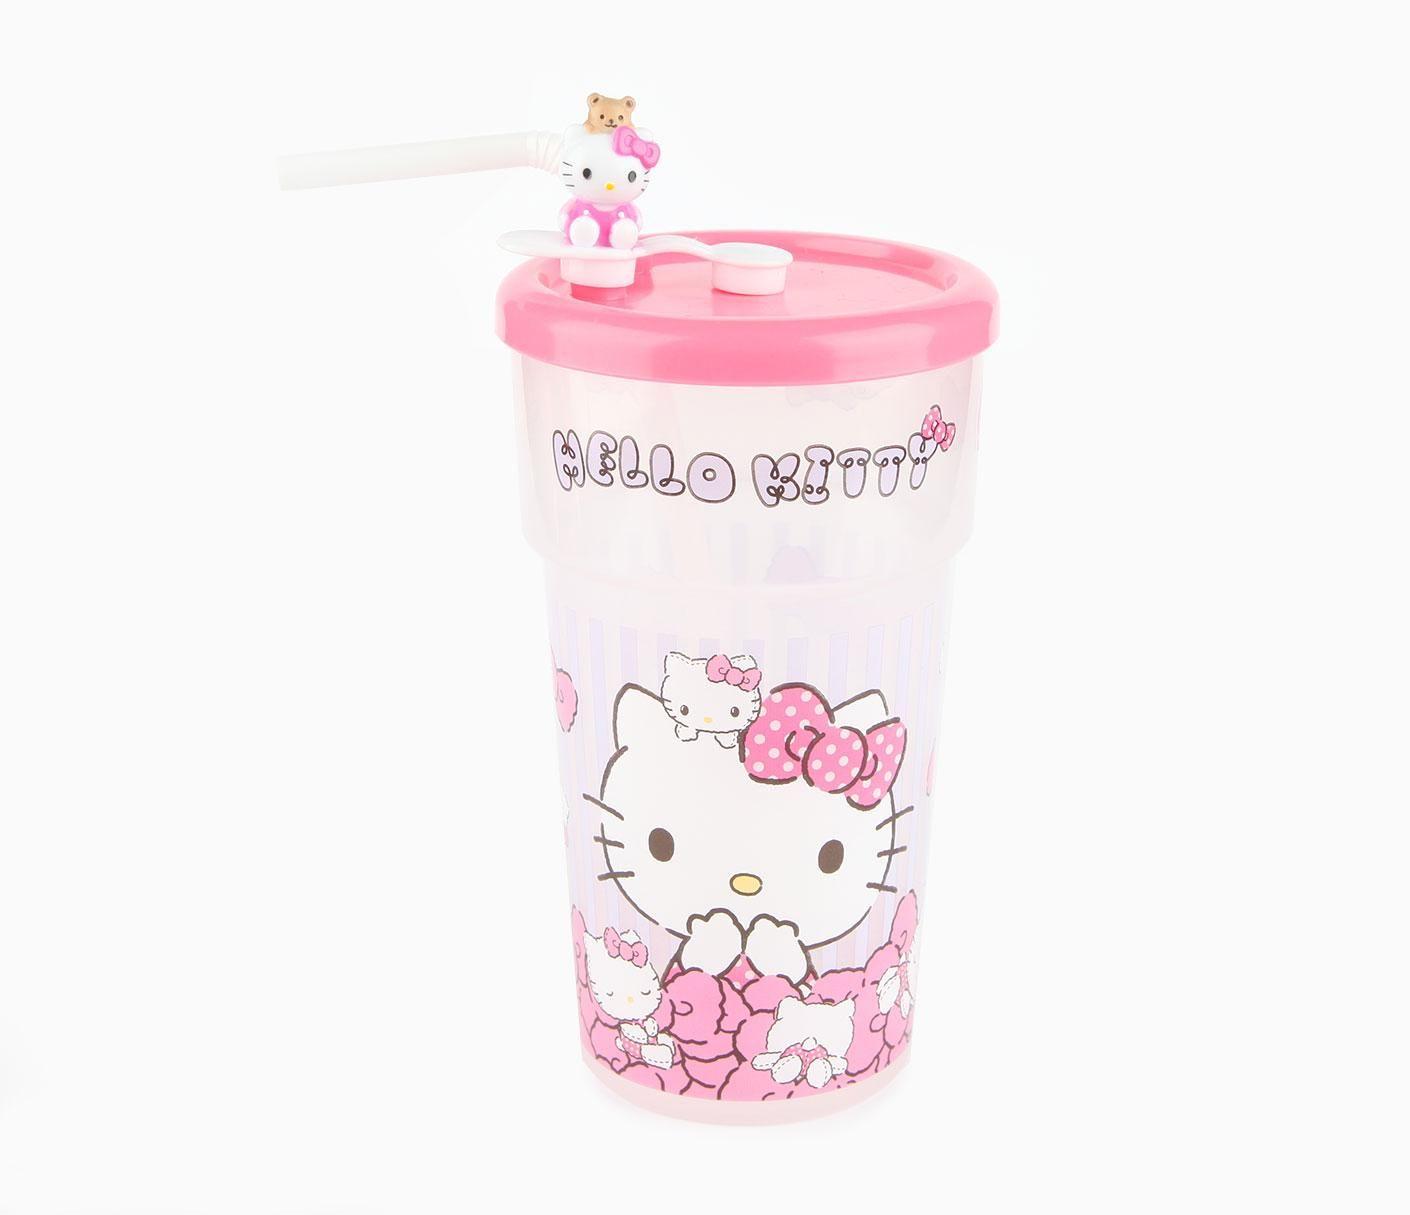 Hello Kitty Straw Cup: Doll | ✽Wishlist✽ | Pinterest | Hello kitty ...